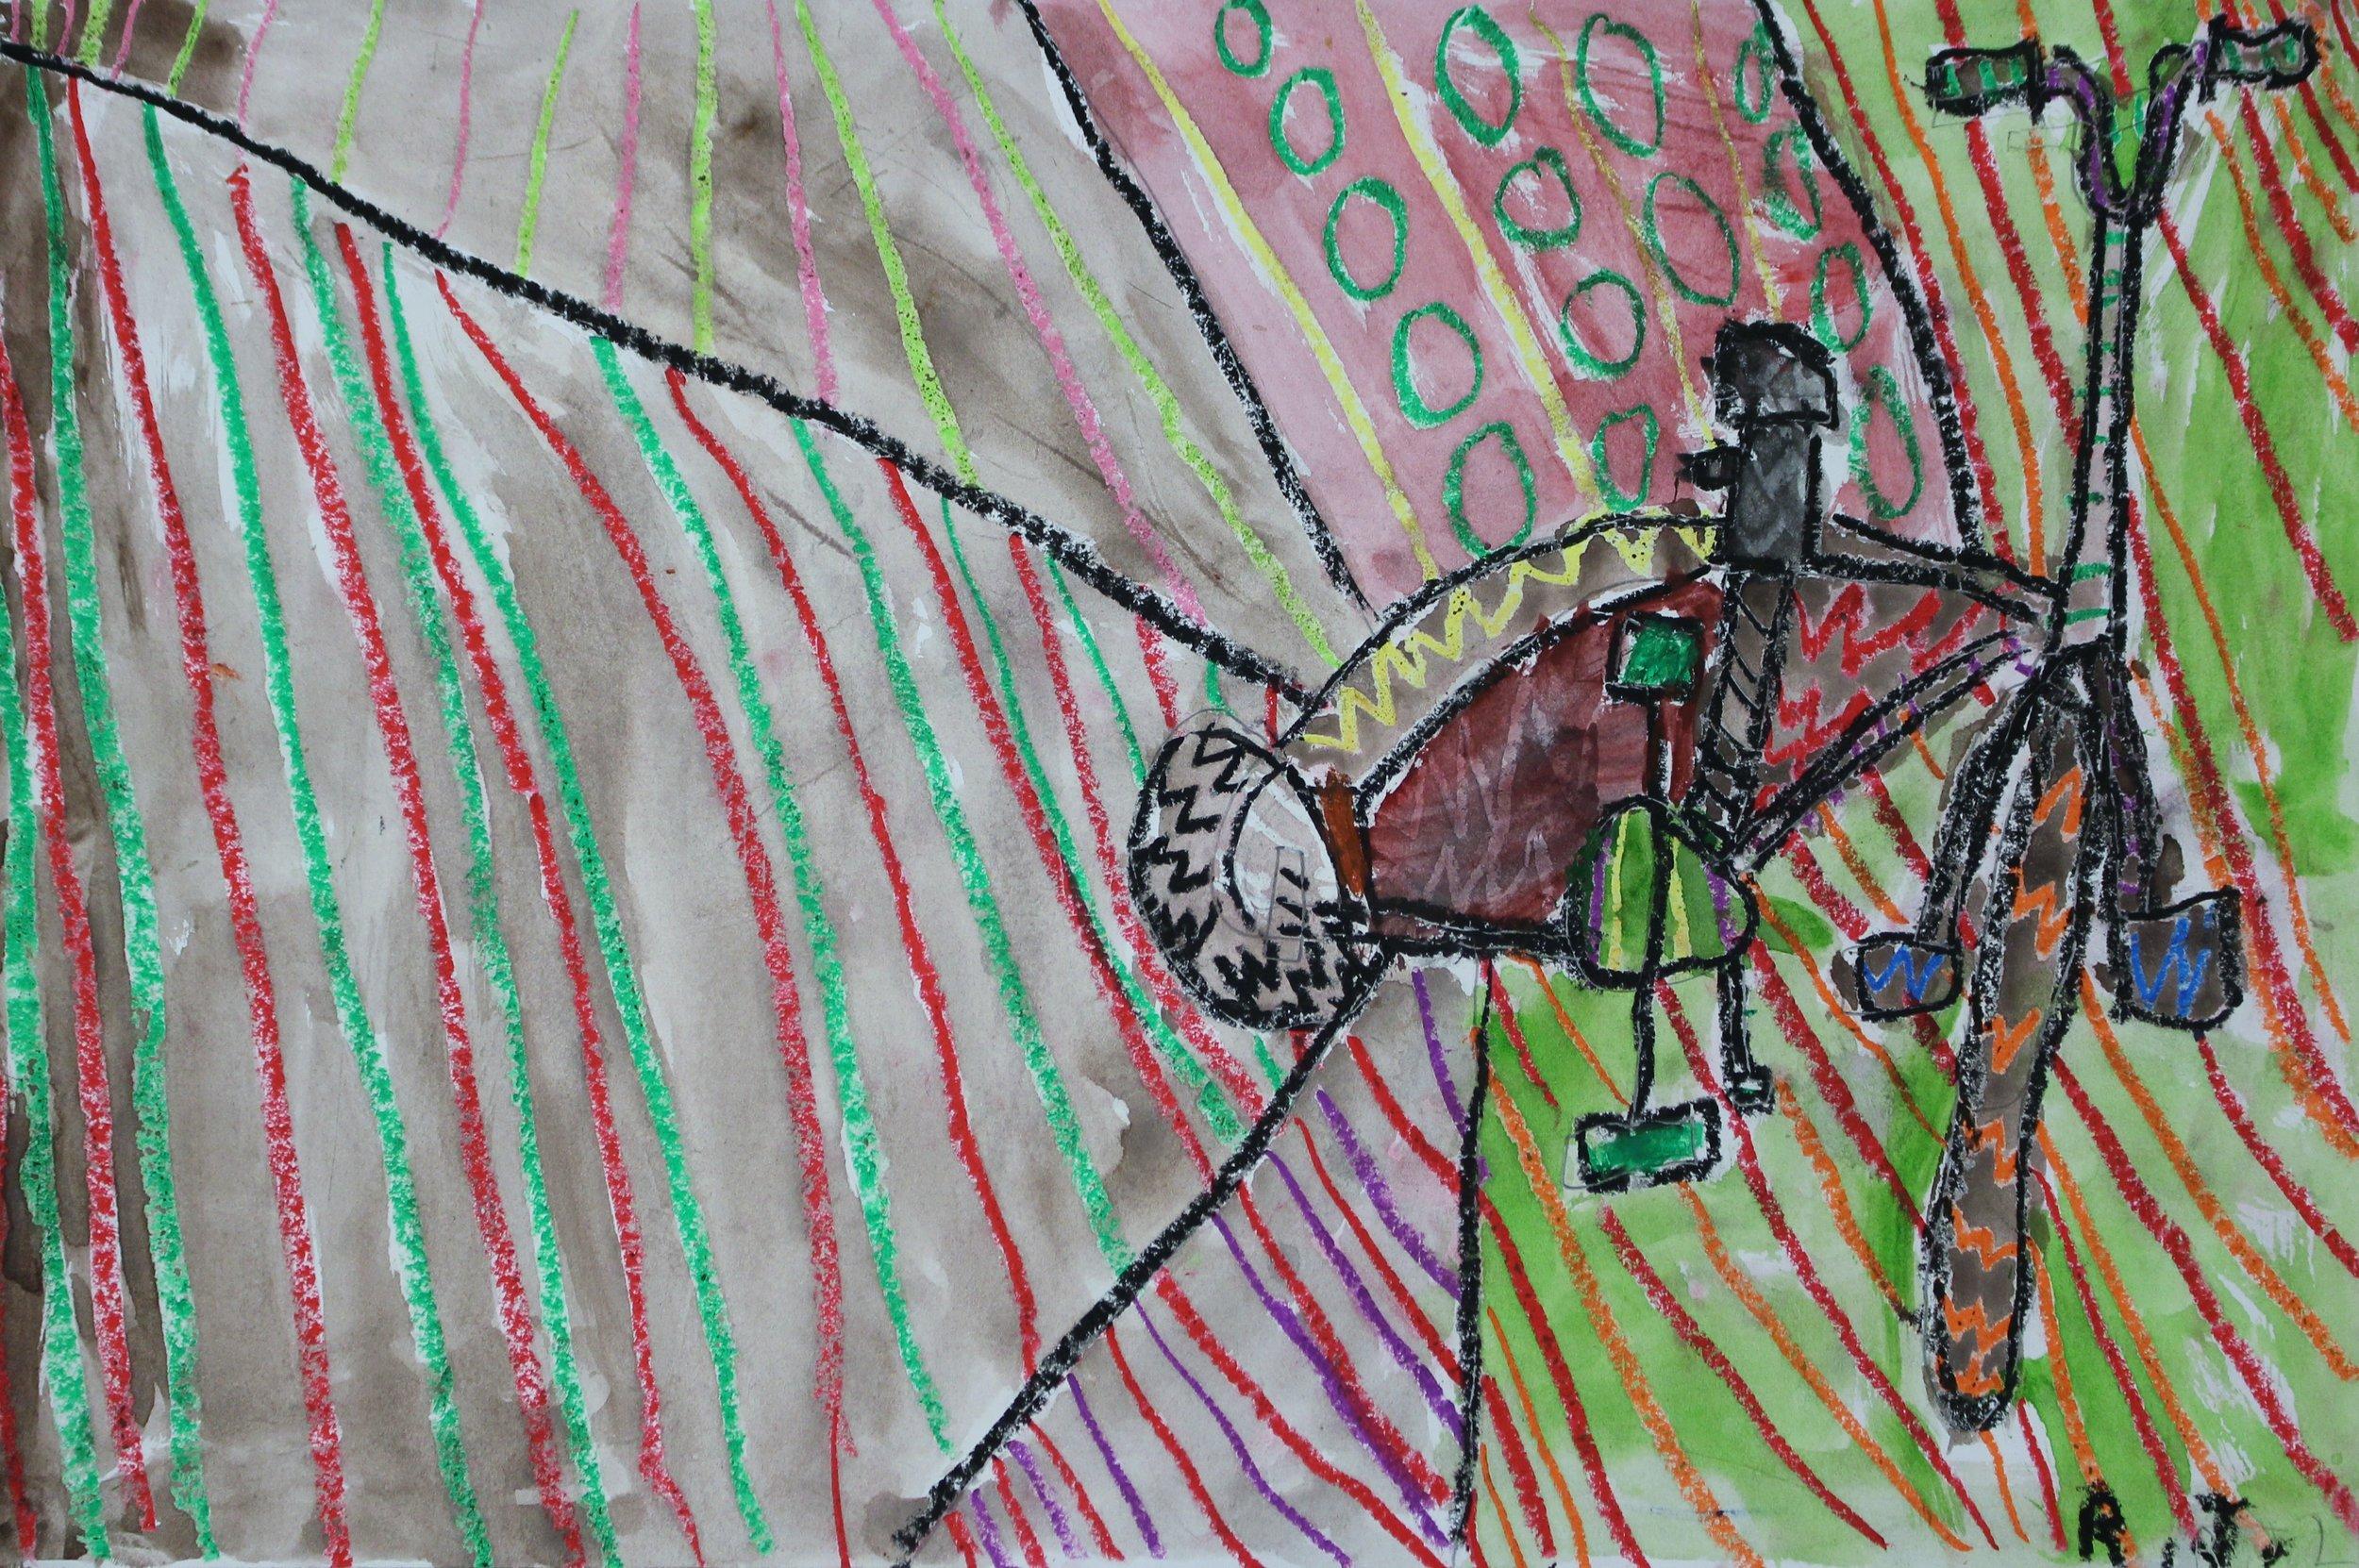 2nd Grade: Robert Buckley (Romero Britto Pop Art)